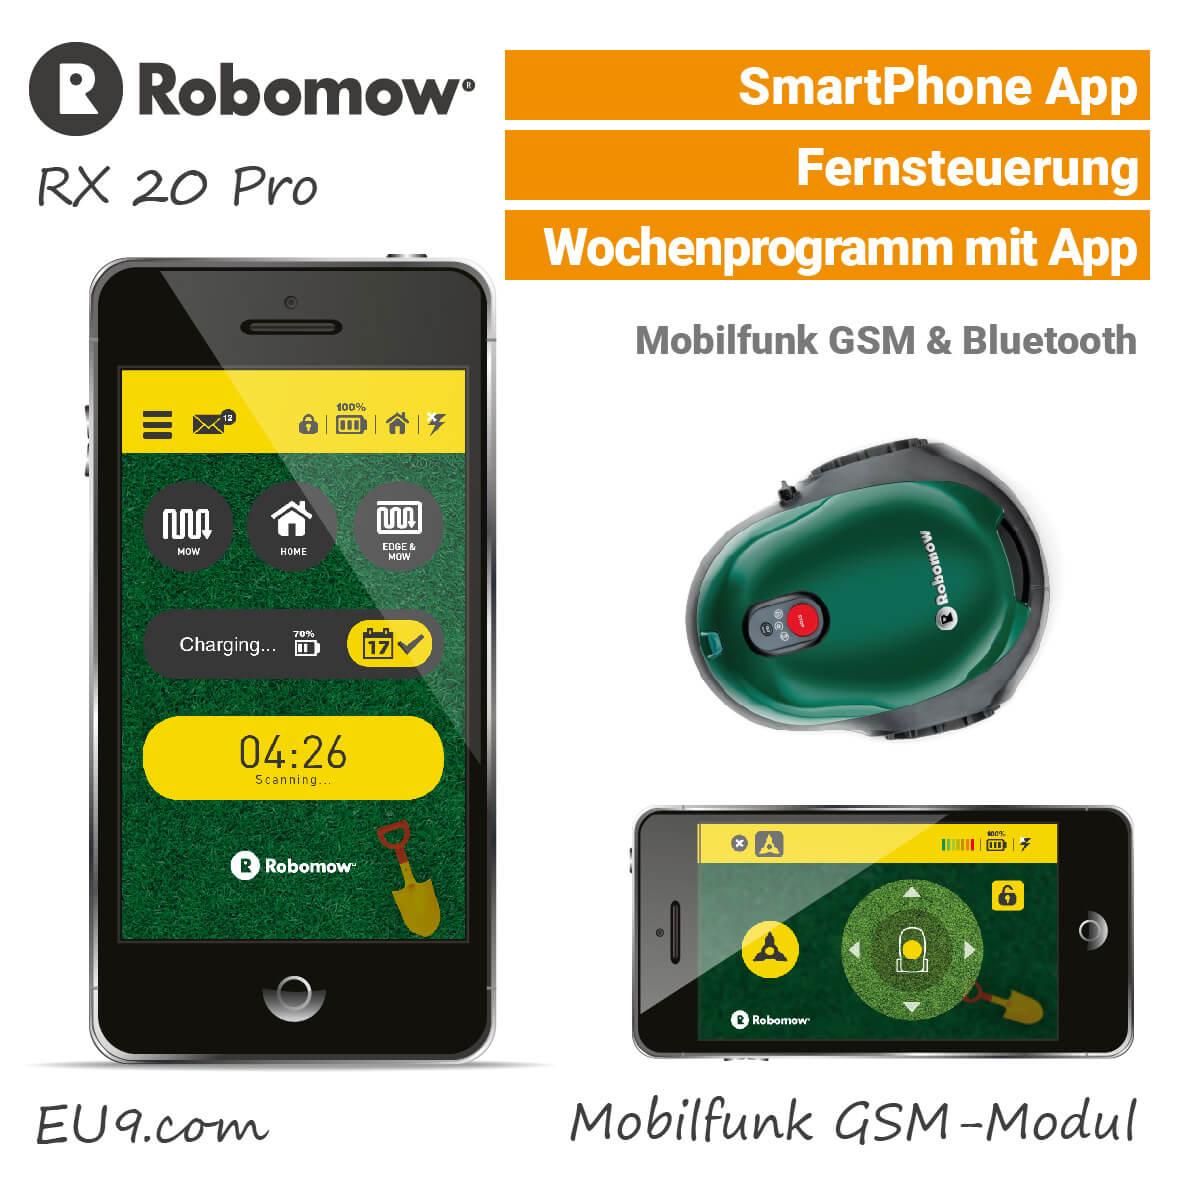 robomow rx 20 pro m hroboter mit mobilfunk g nstig bei eu9 kaufen. Black Bedroom Furniture Sets. Home Design Ideas